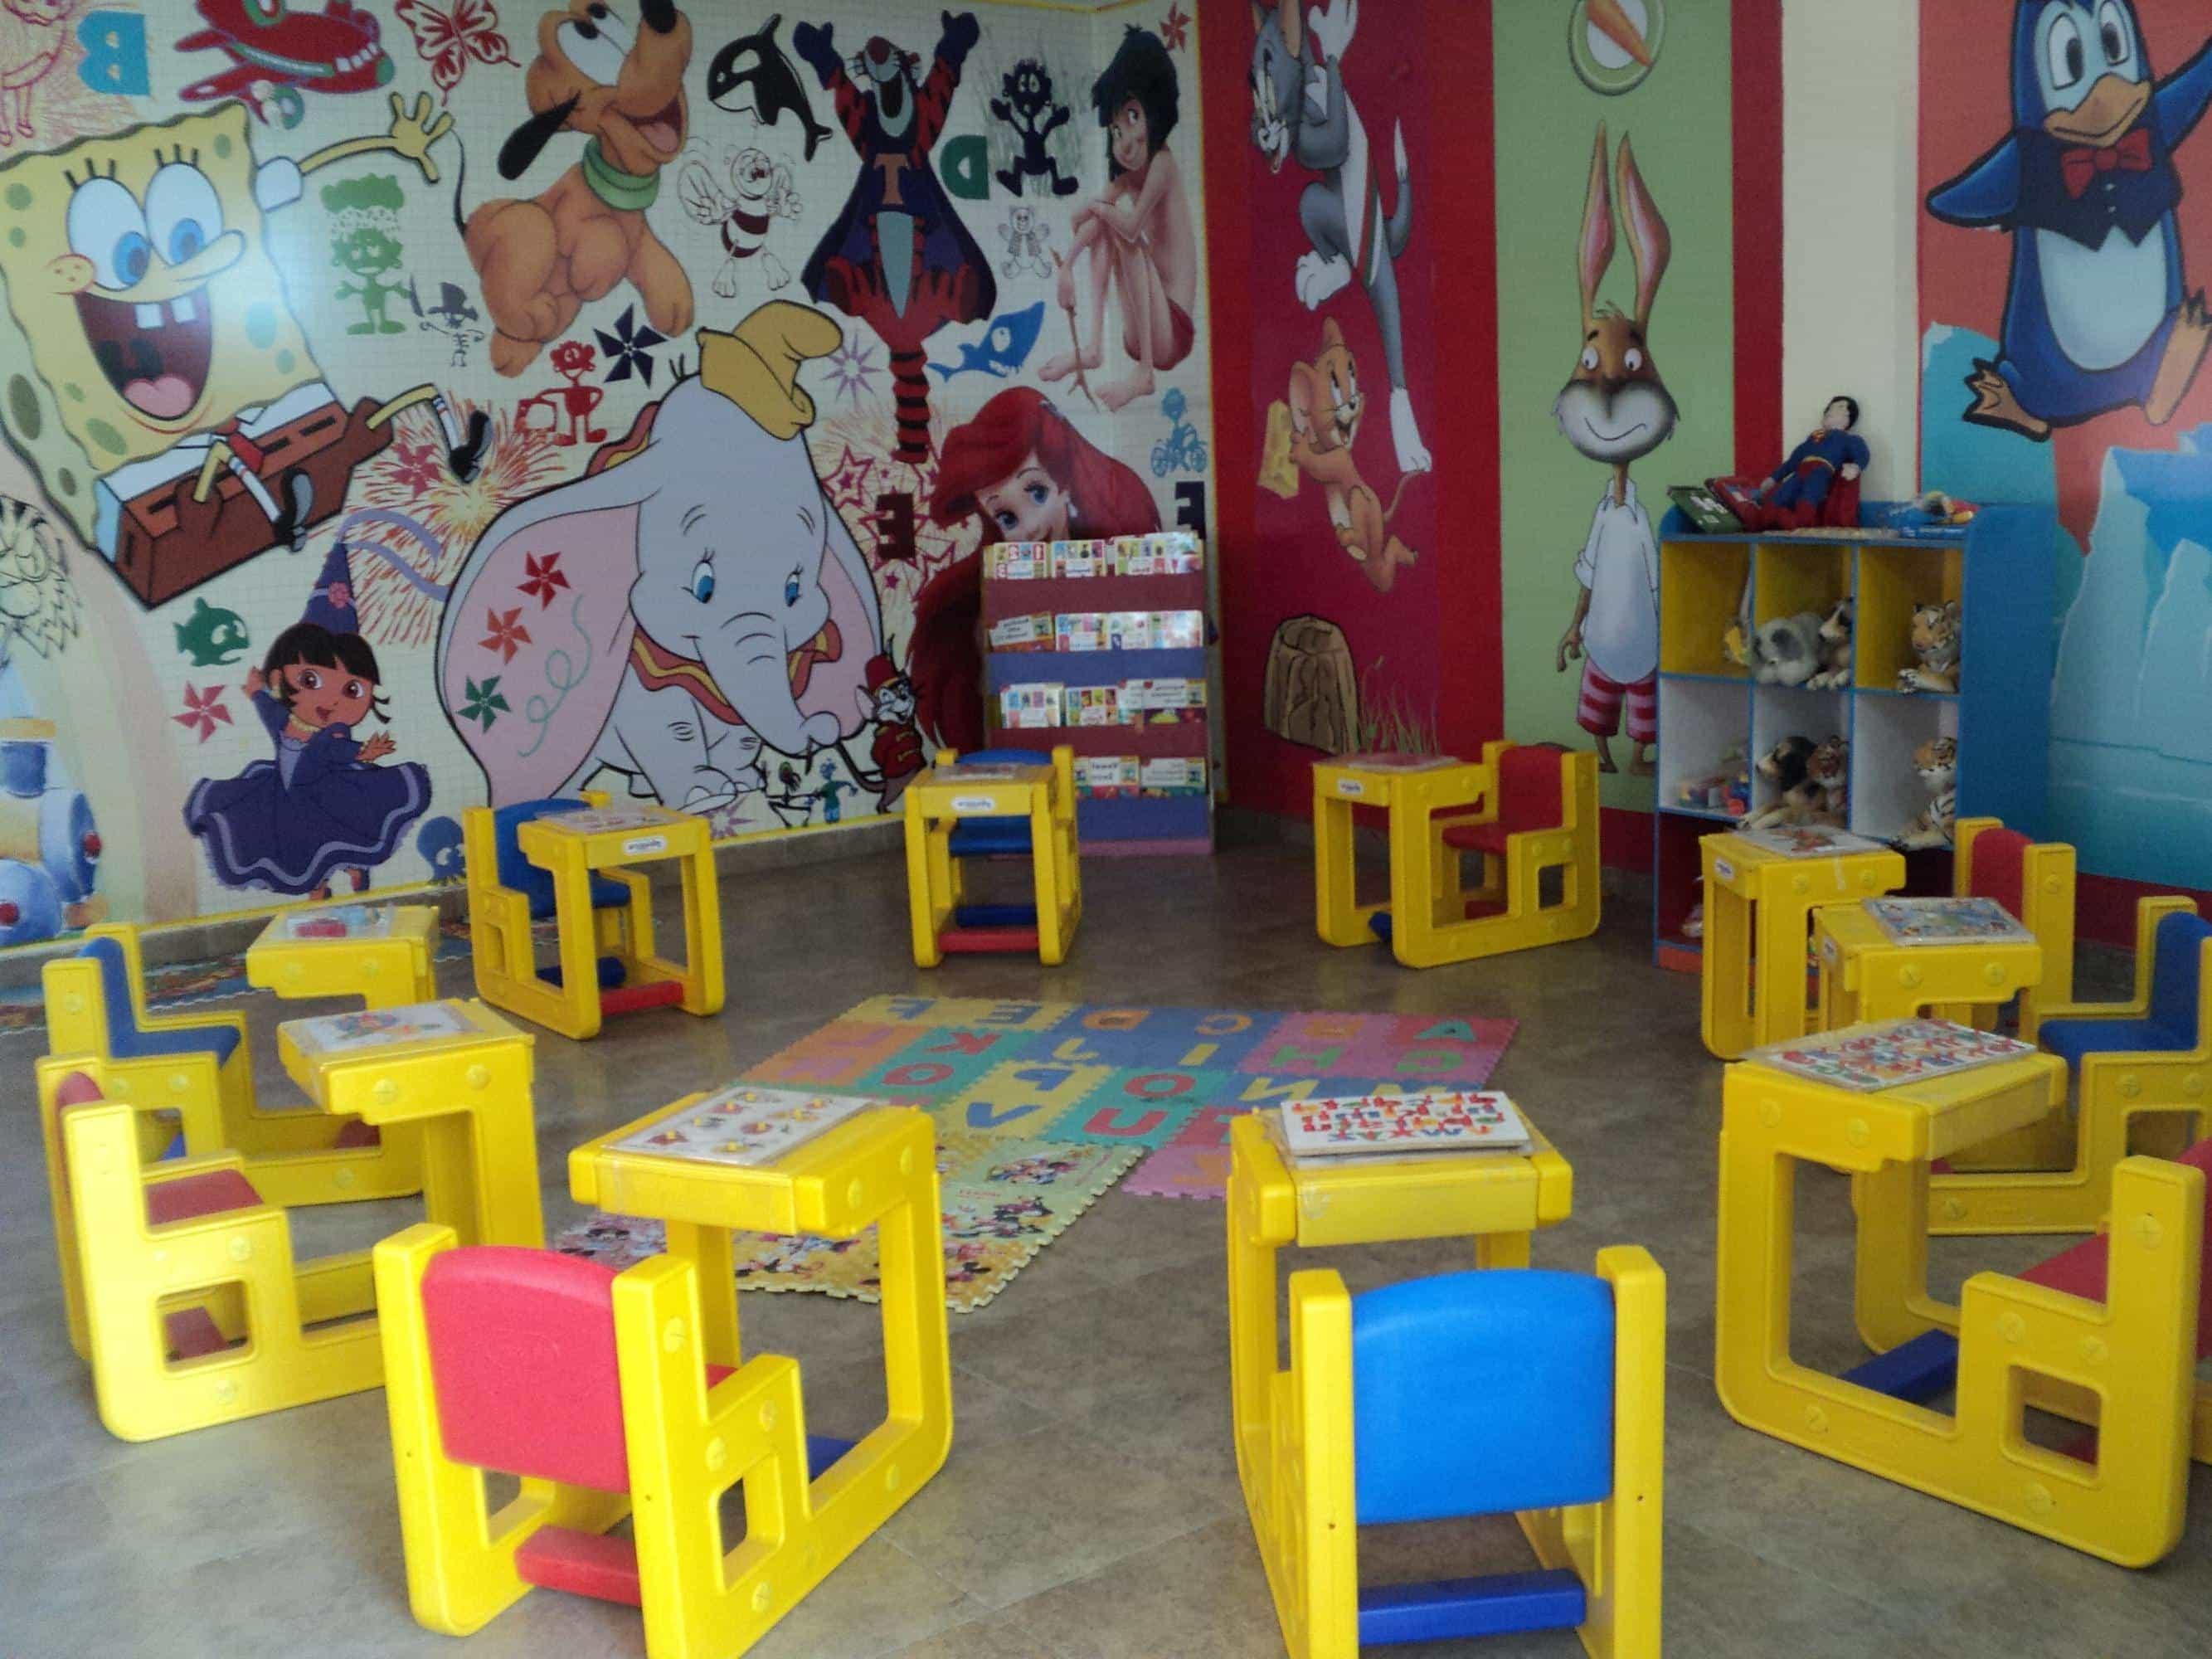 kindergarten dream meaning, dream about kindergarten, kindergarten dream interpretation, seeing in a dream kindergarten